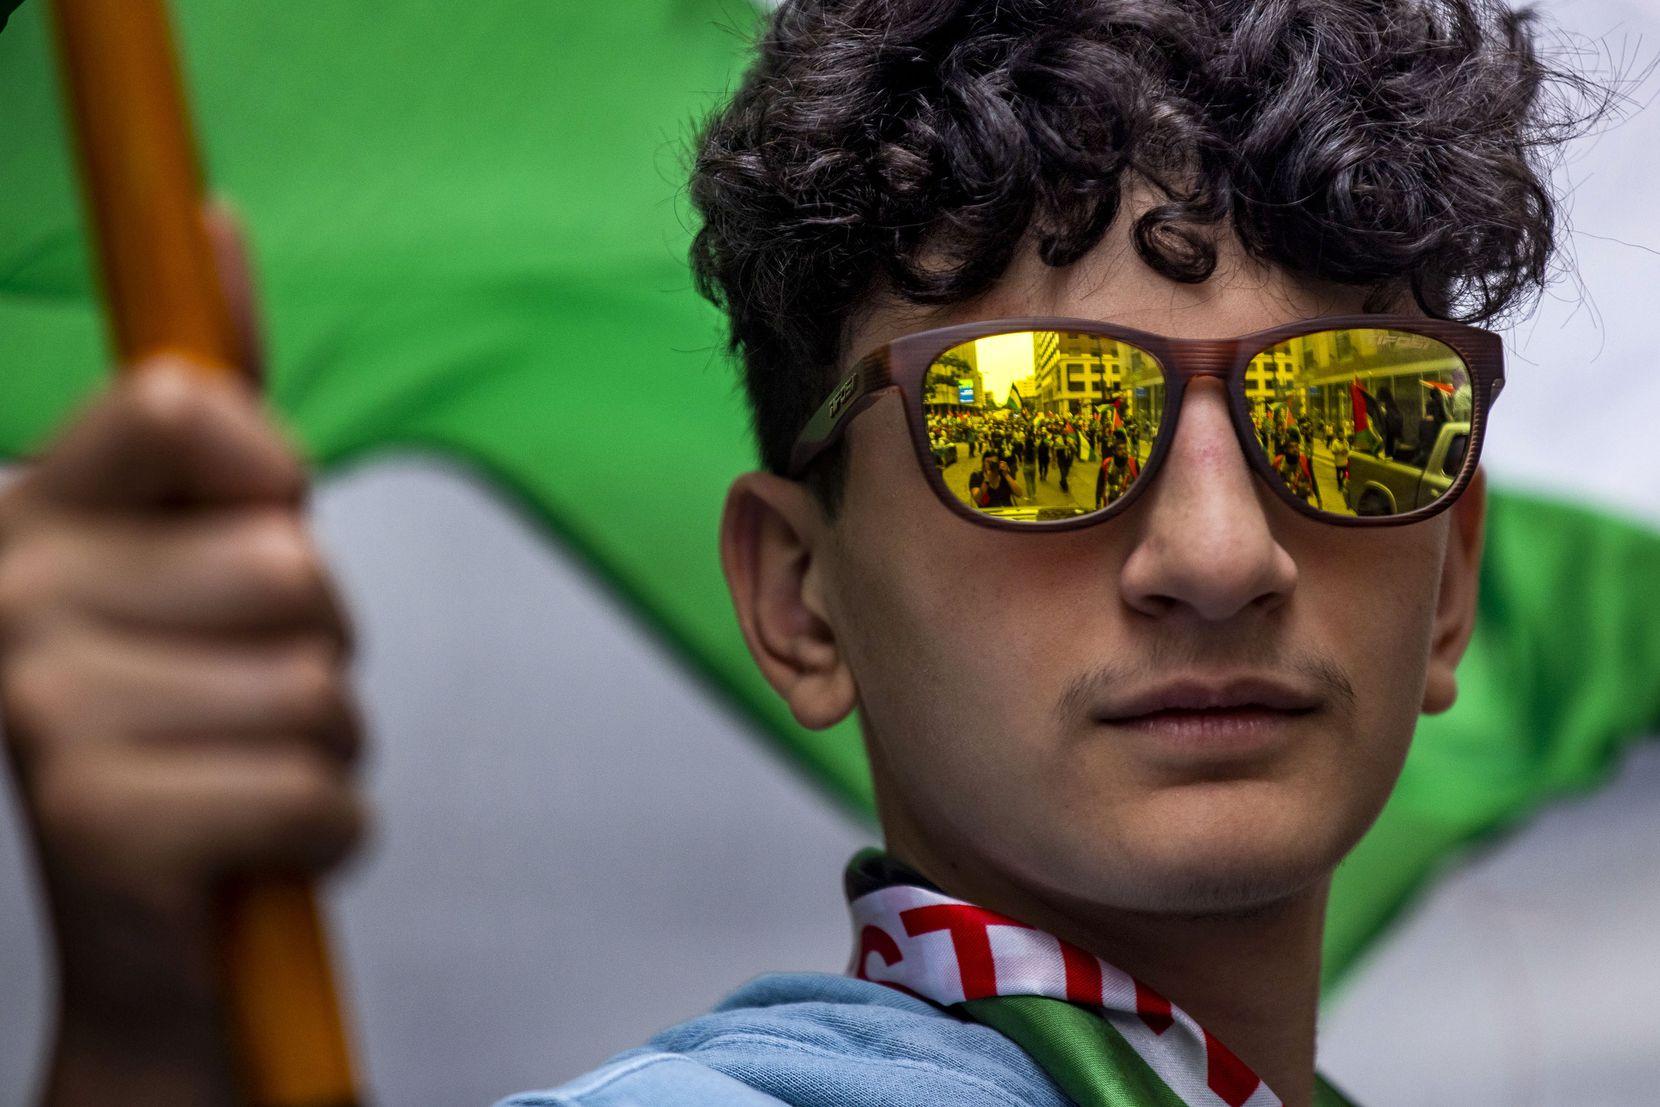 Hamzah Kayyas, 15, was among many young people who turned out on Sunday.